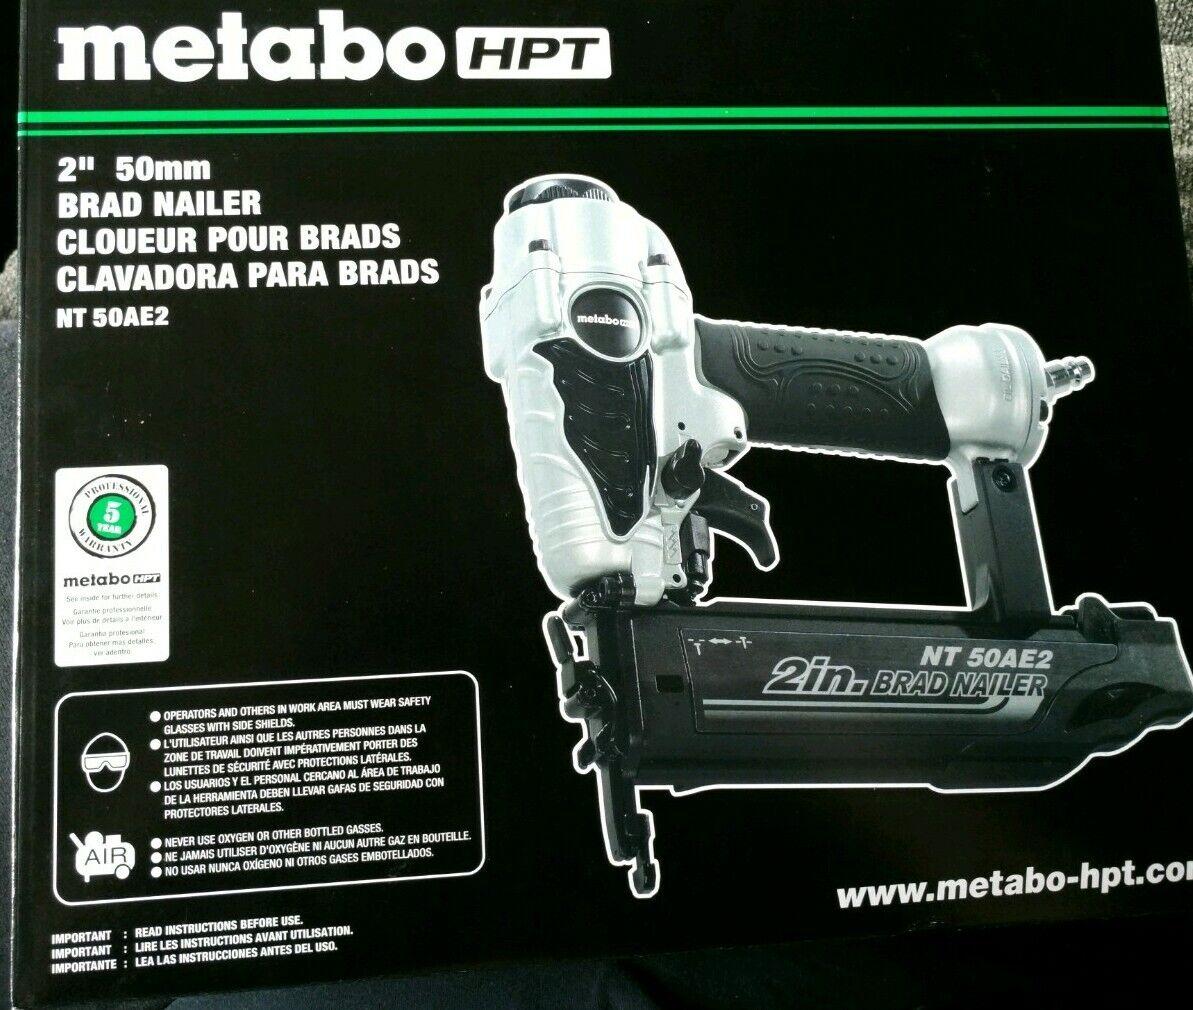 Metabo HPT Brad Nailer 2  50mm  NT 50AE2 NEW